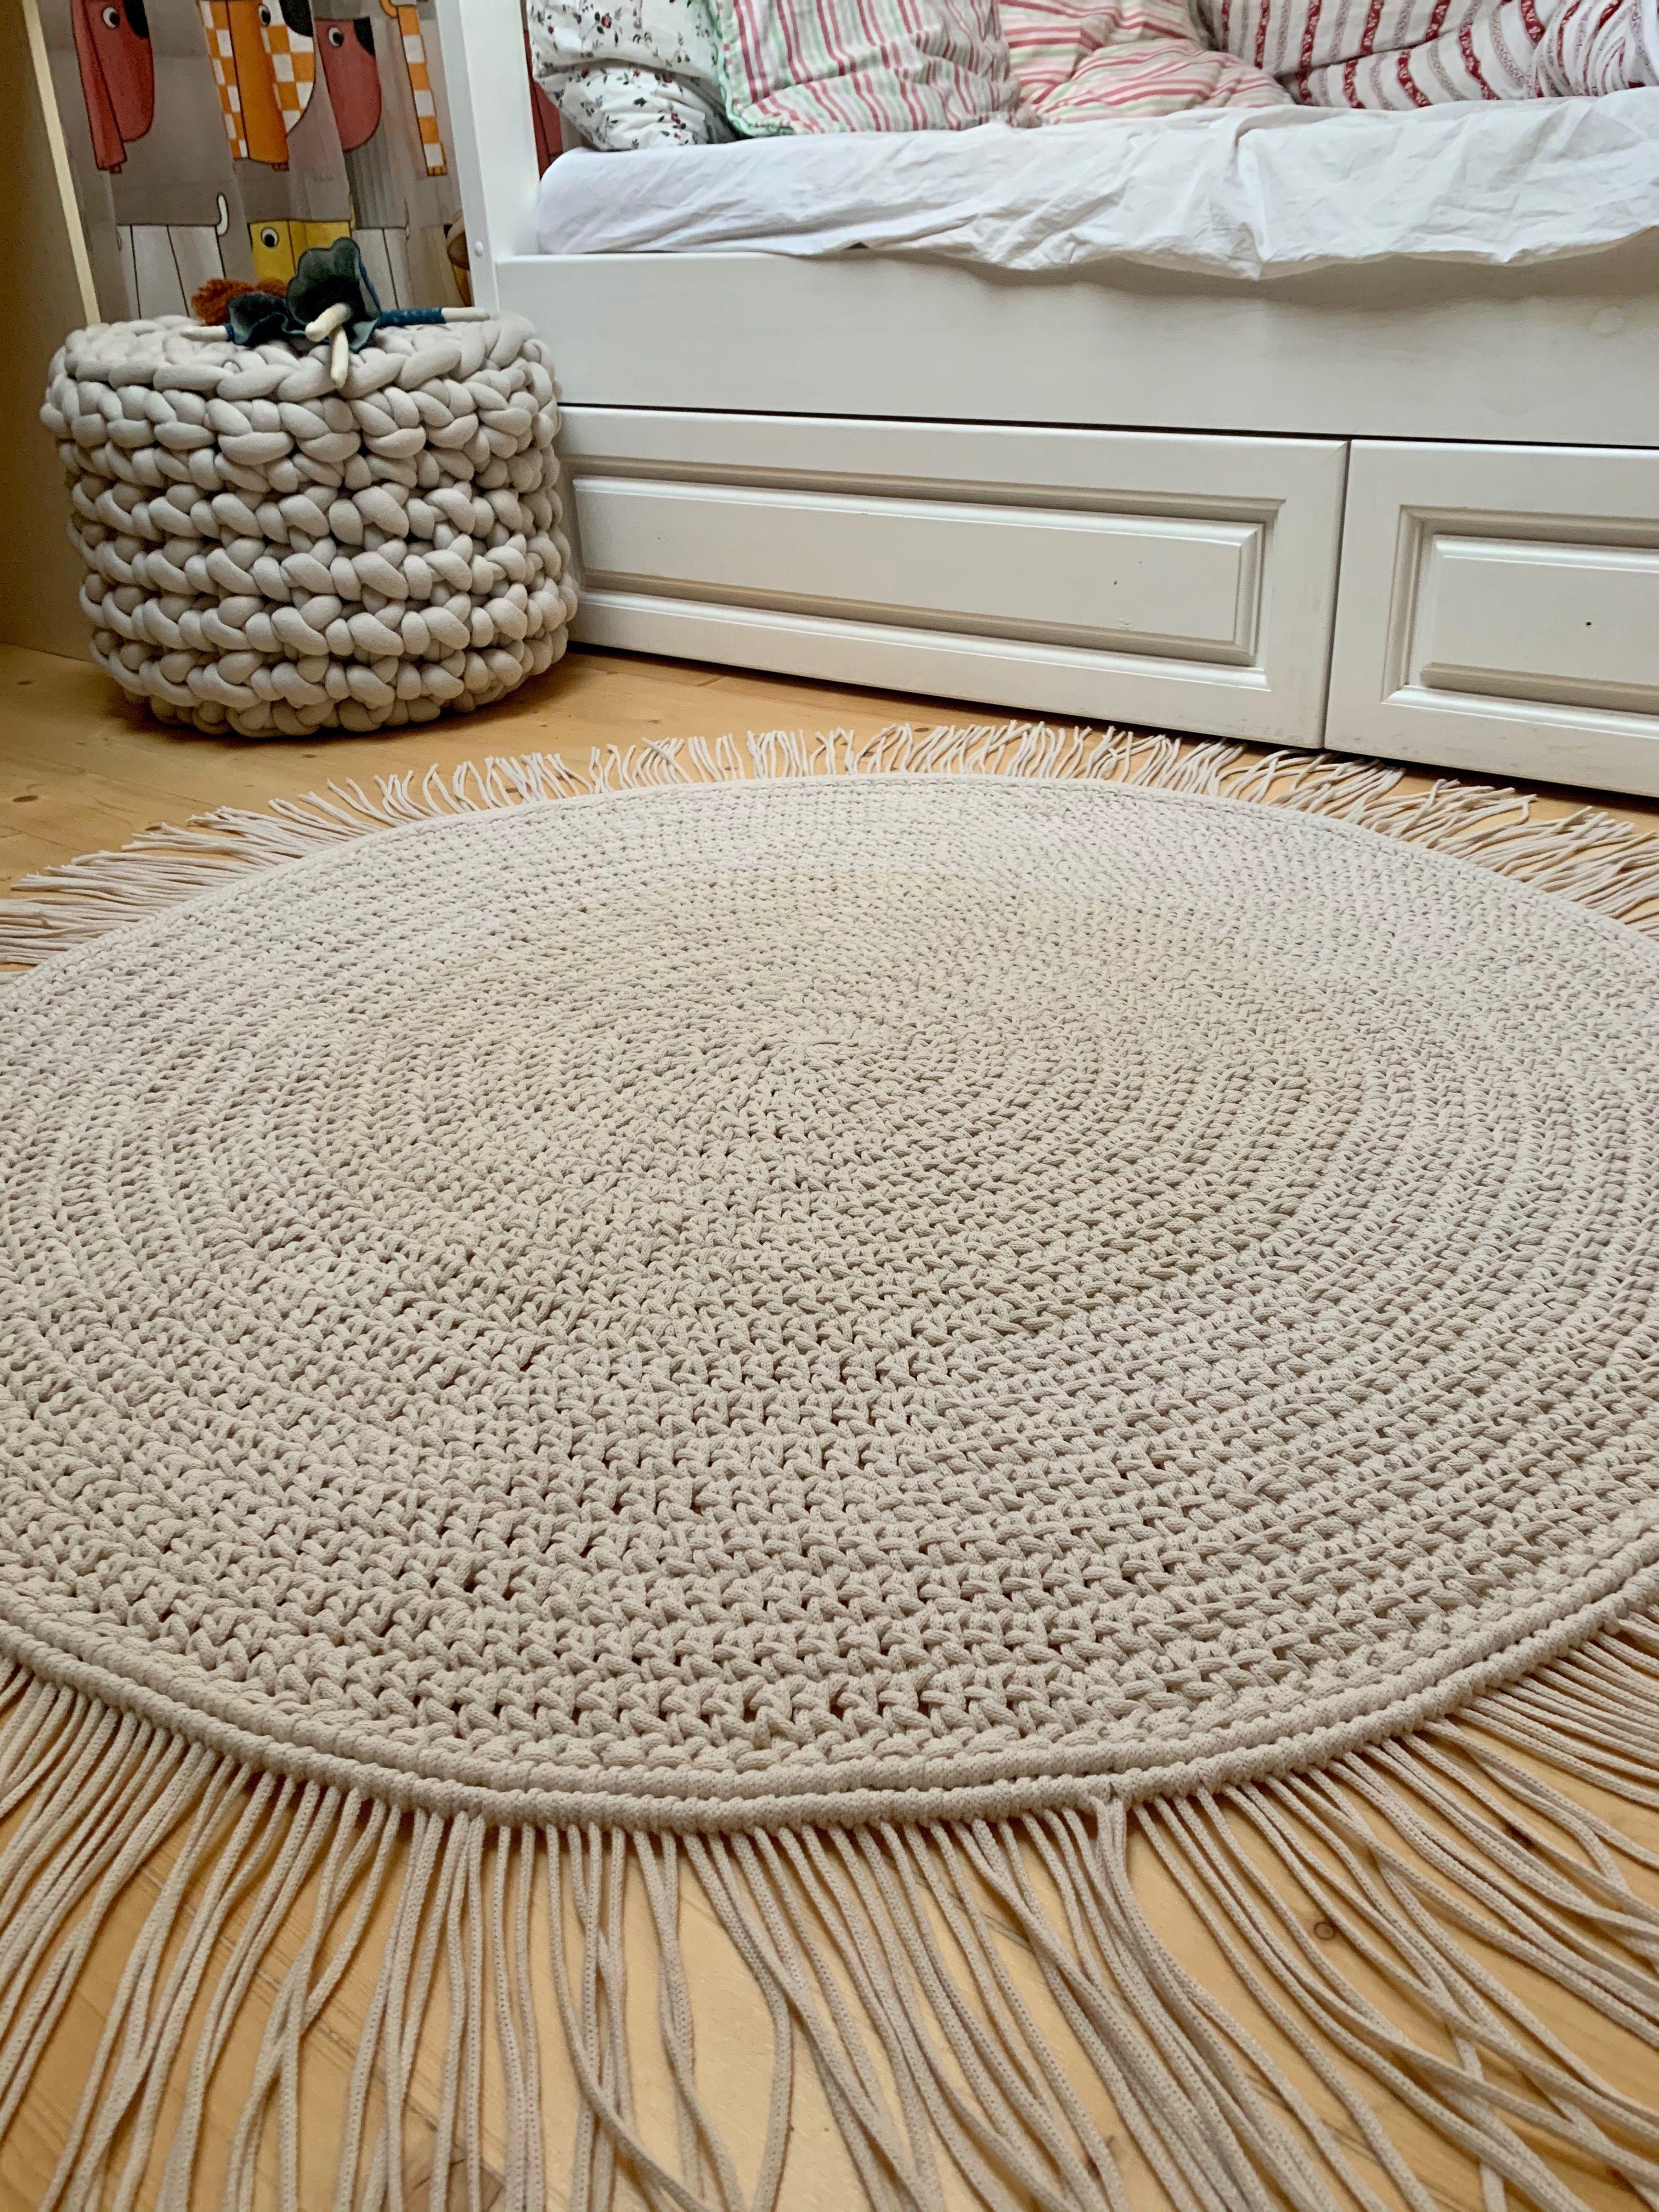 Macrame Rug Crochet Rug Round Crochet Rug Pattern Crochet Rag Rug Nursery Rug Wicker Carpet Easy Crochet Pattern Carpet Cosy Room Gift In 2020 Childrens Room Rugs Rugs Bohemian Bedroom Design